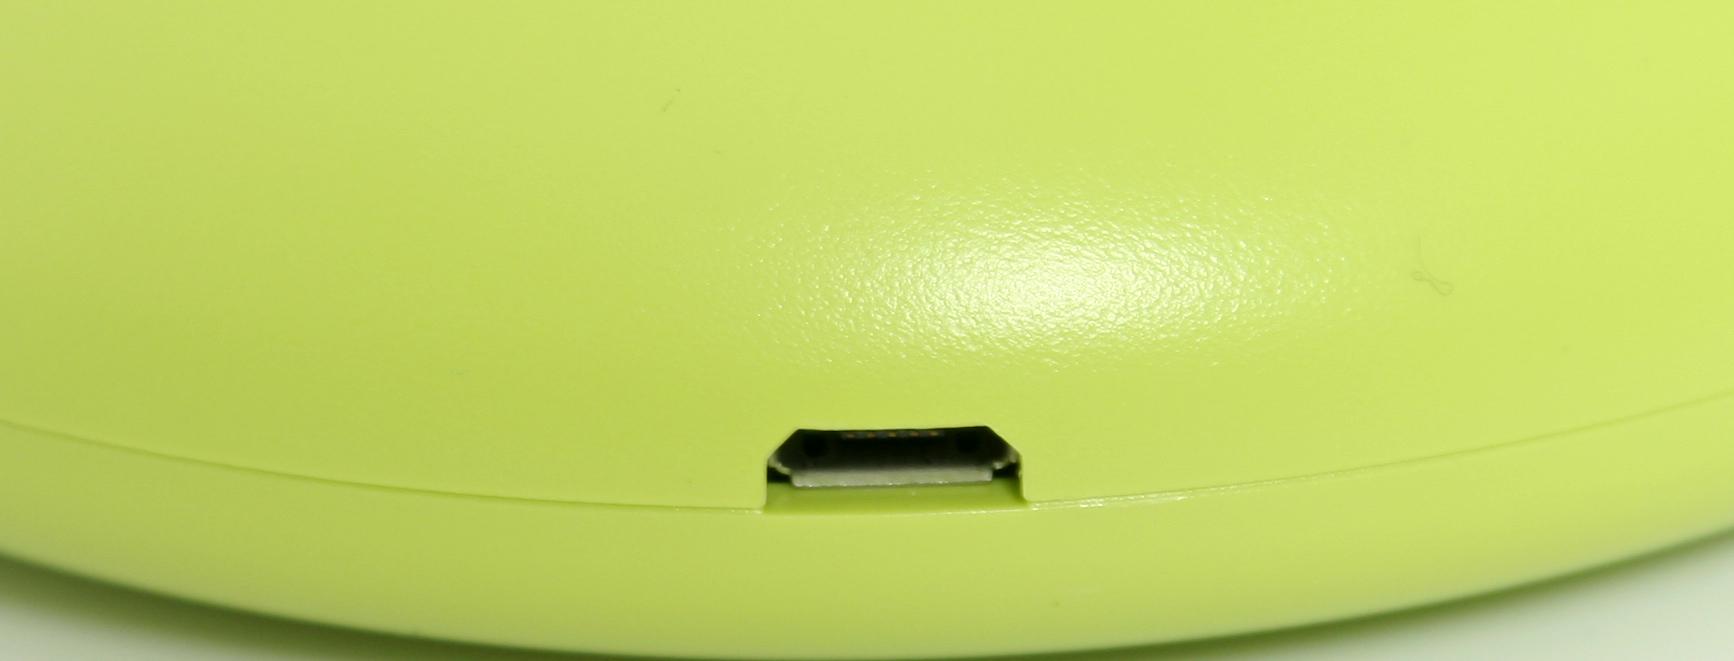 Green_Lamp_USBPort.png